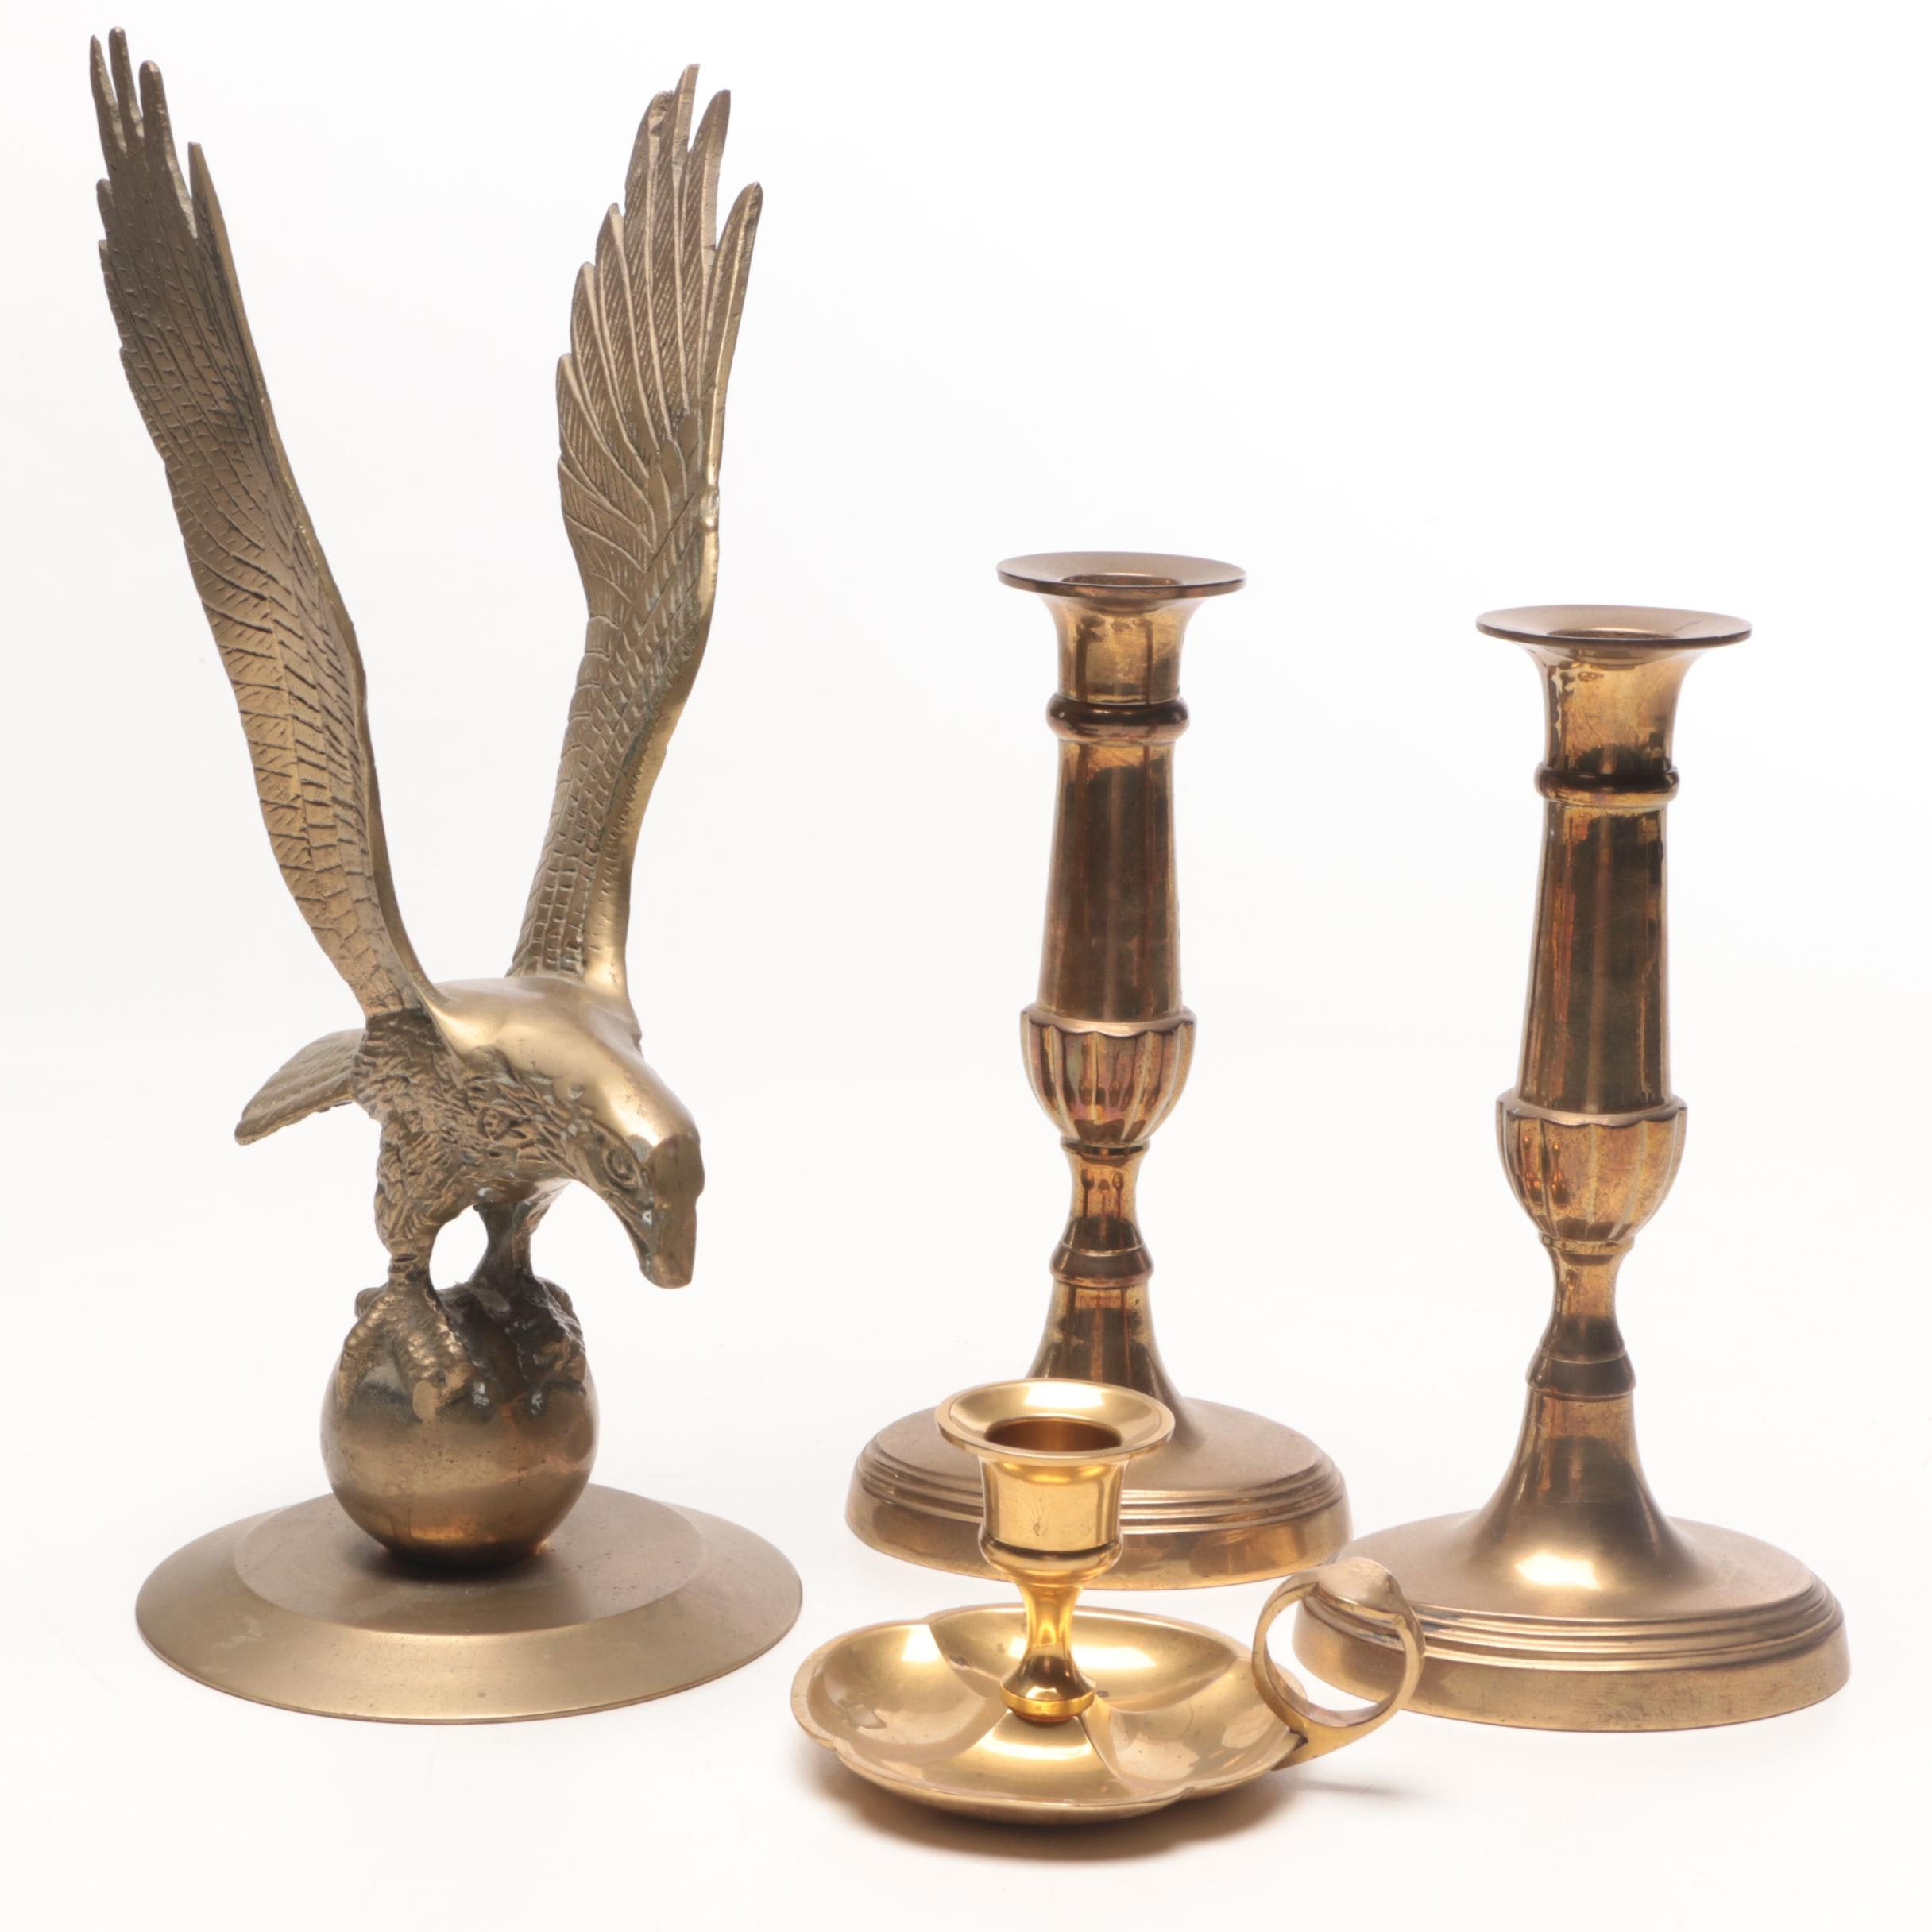 Brass Candlesticks and Eagle Figurine